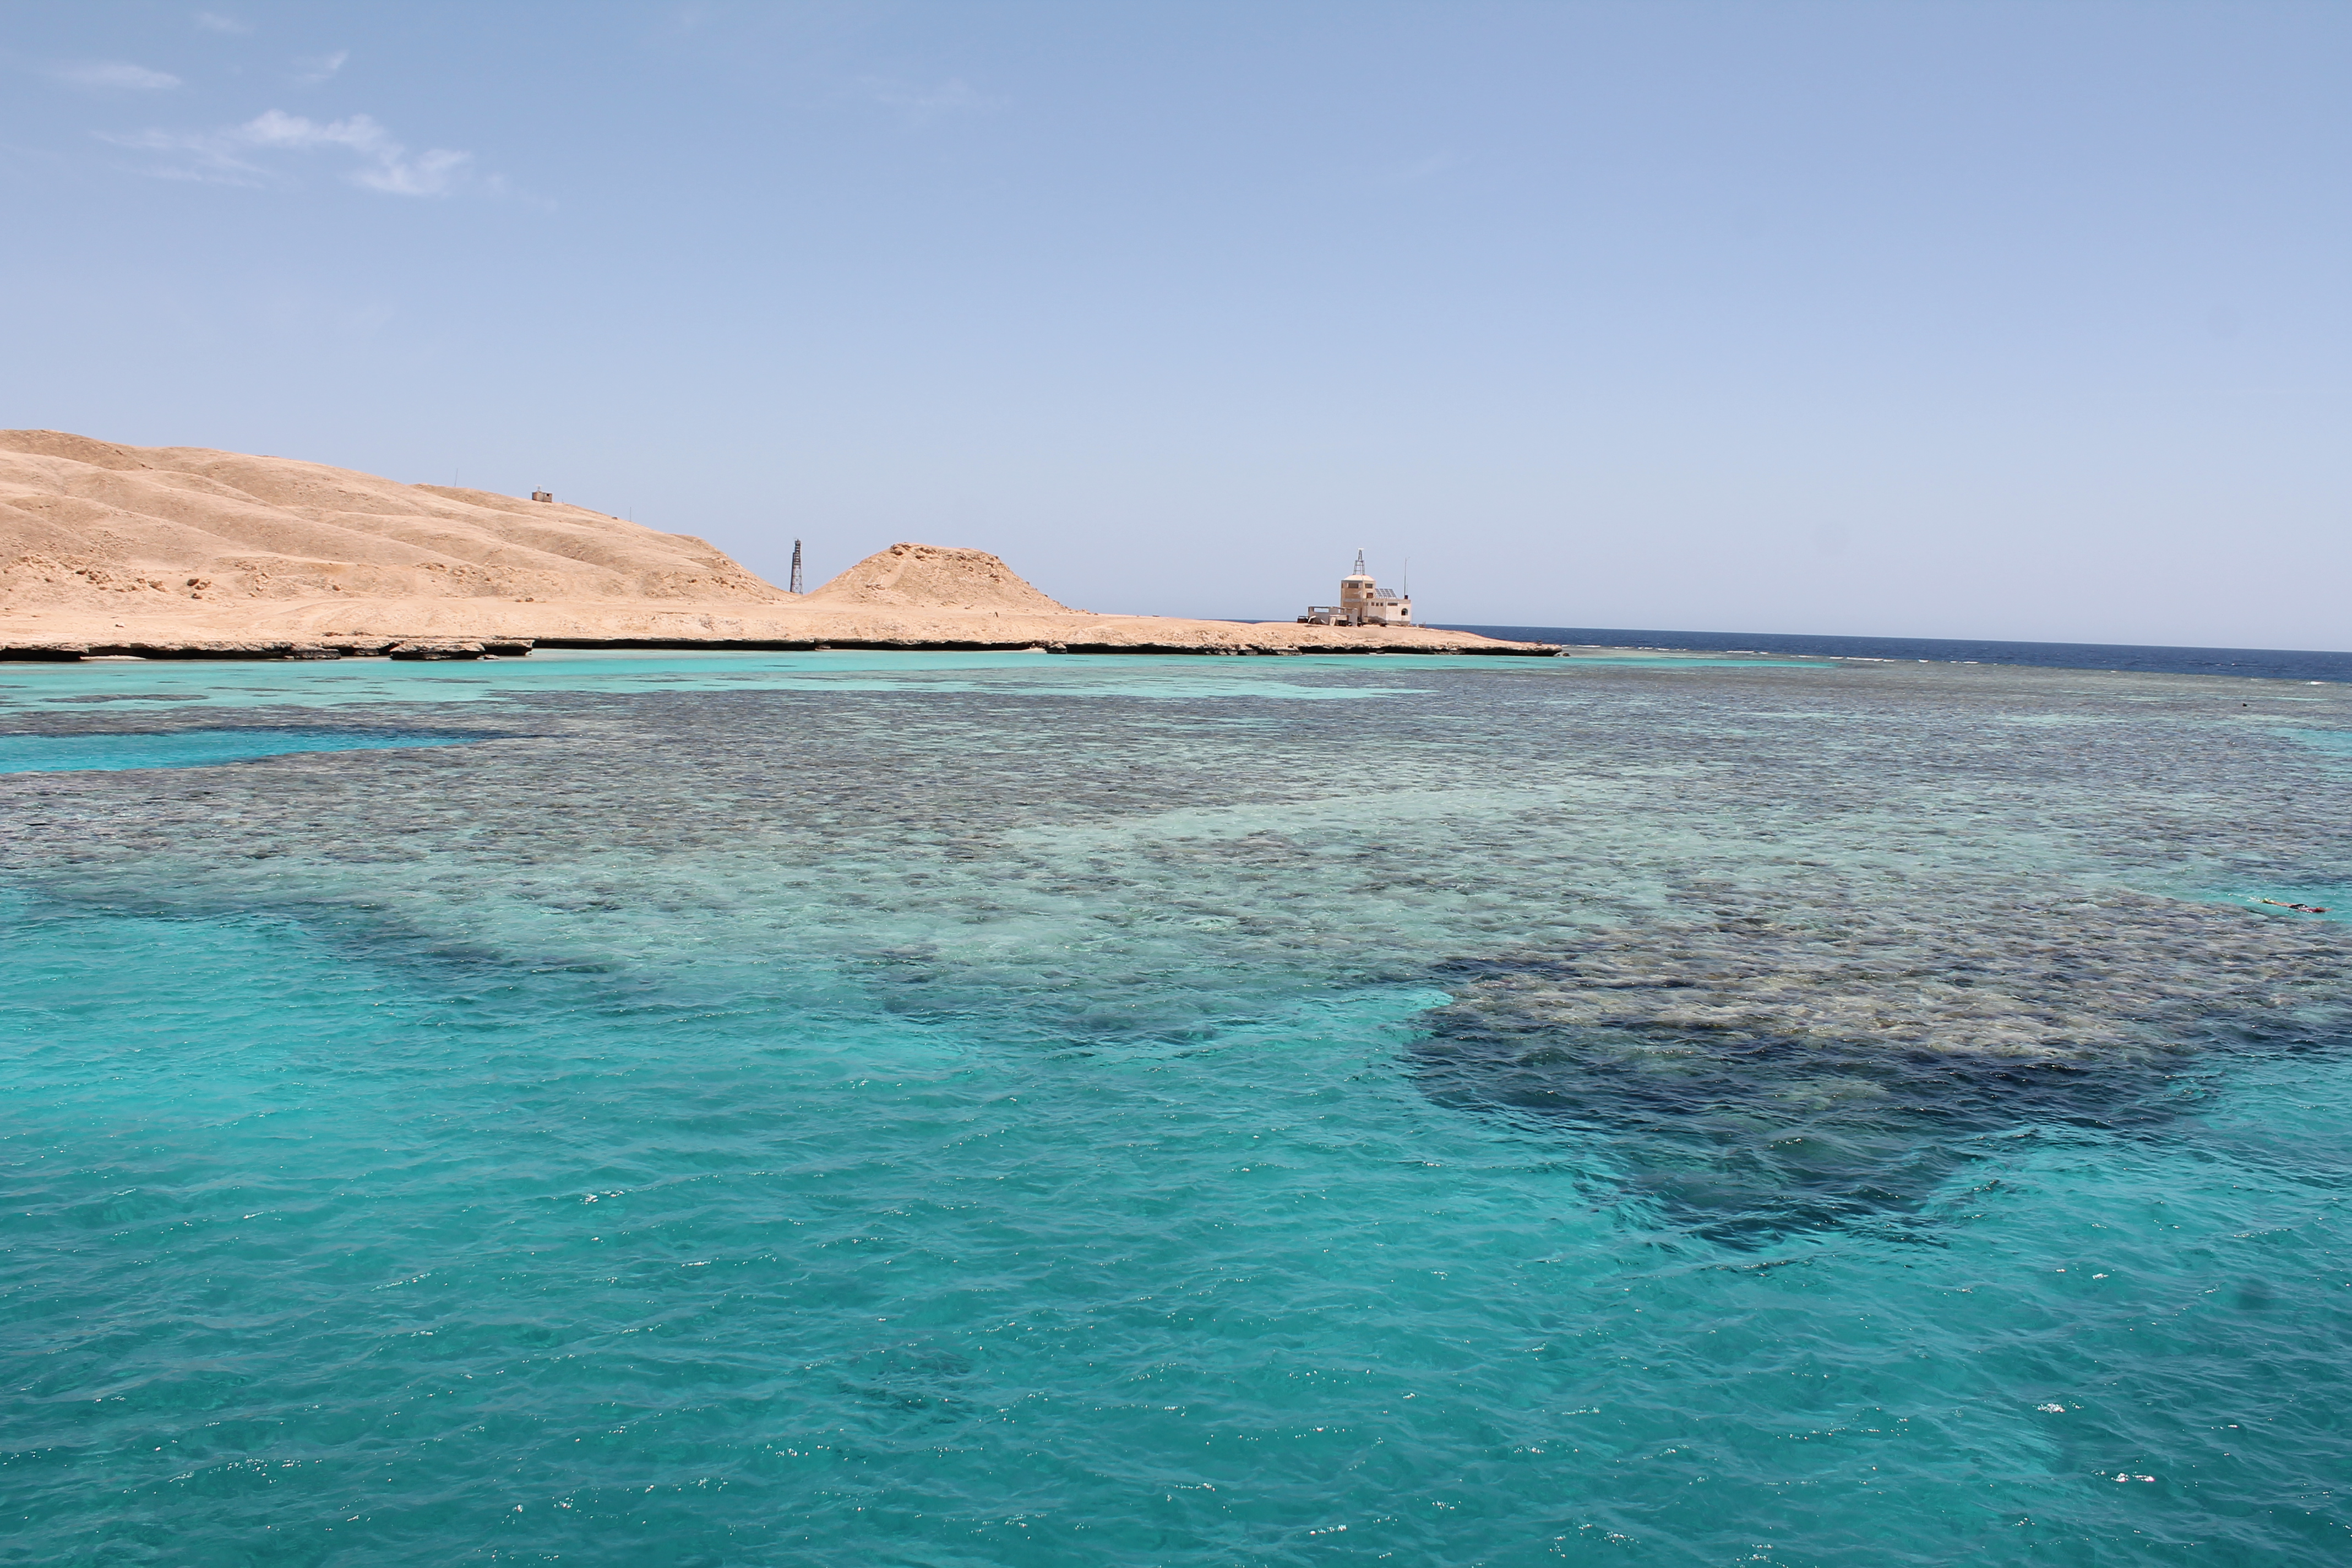 giftun-island-egypt-lustforthesublime